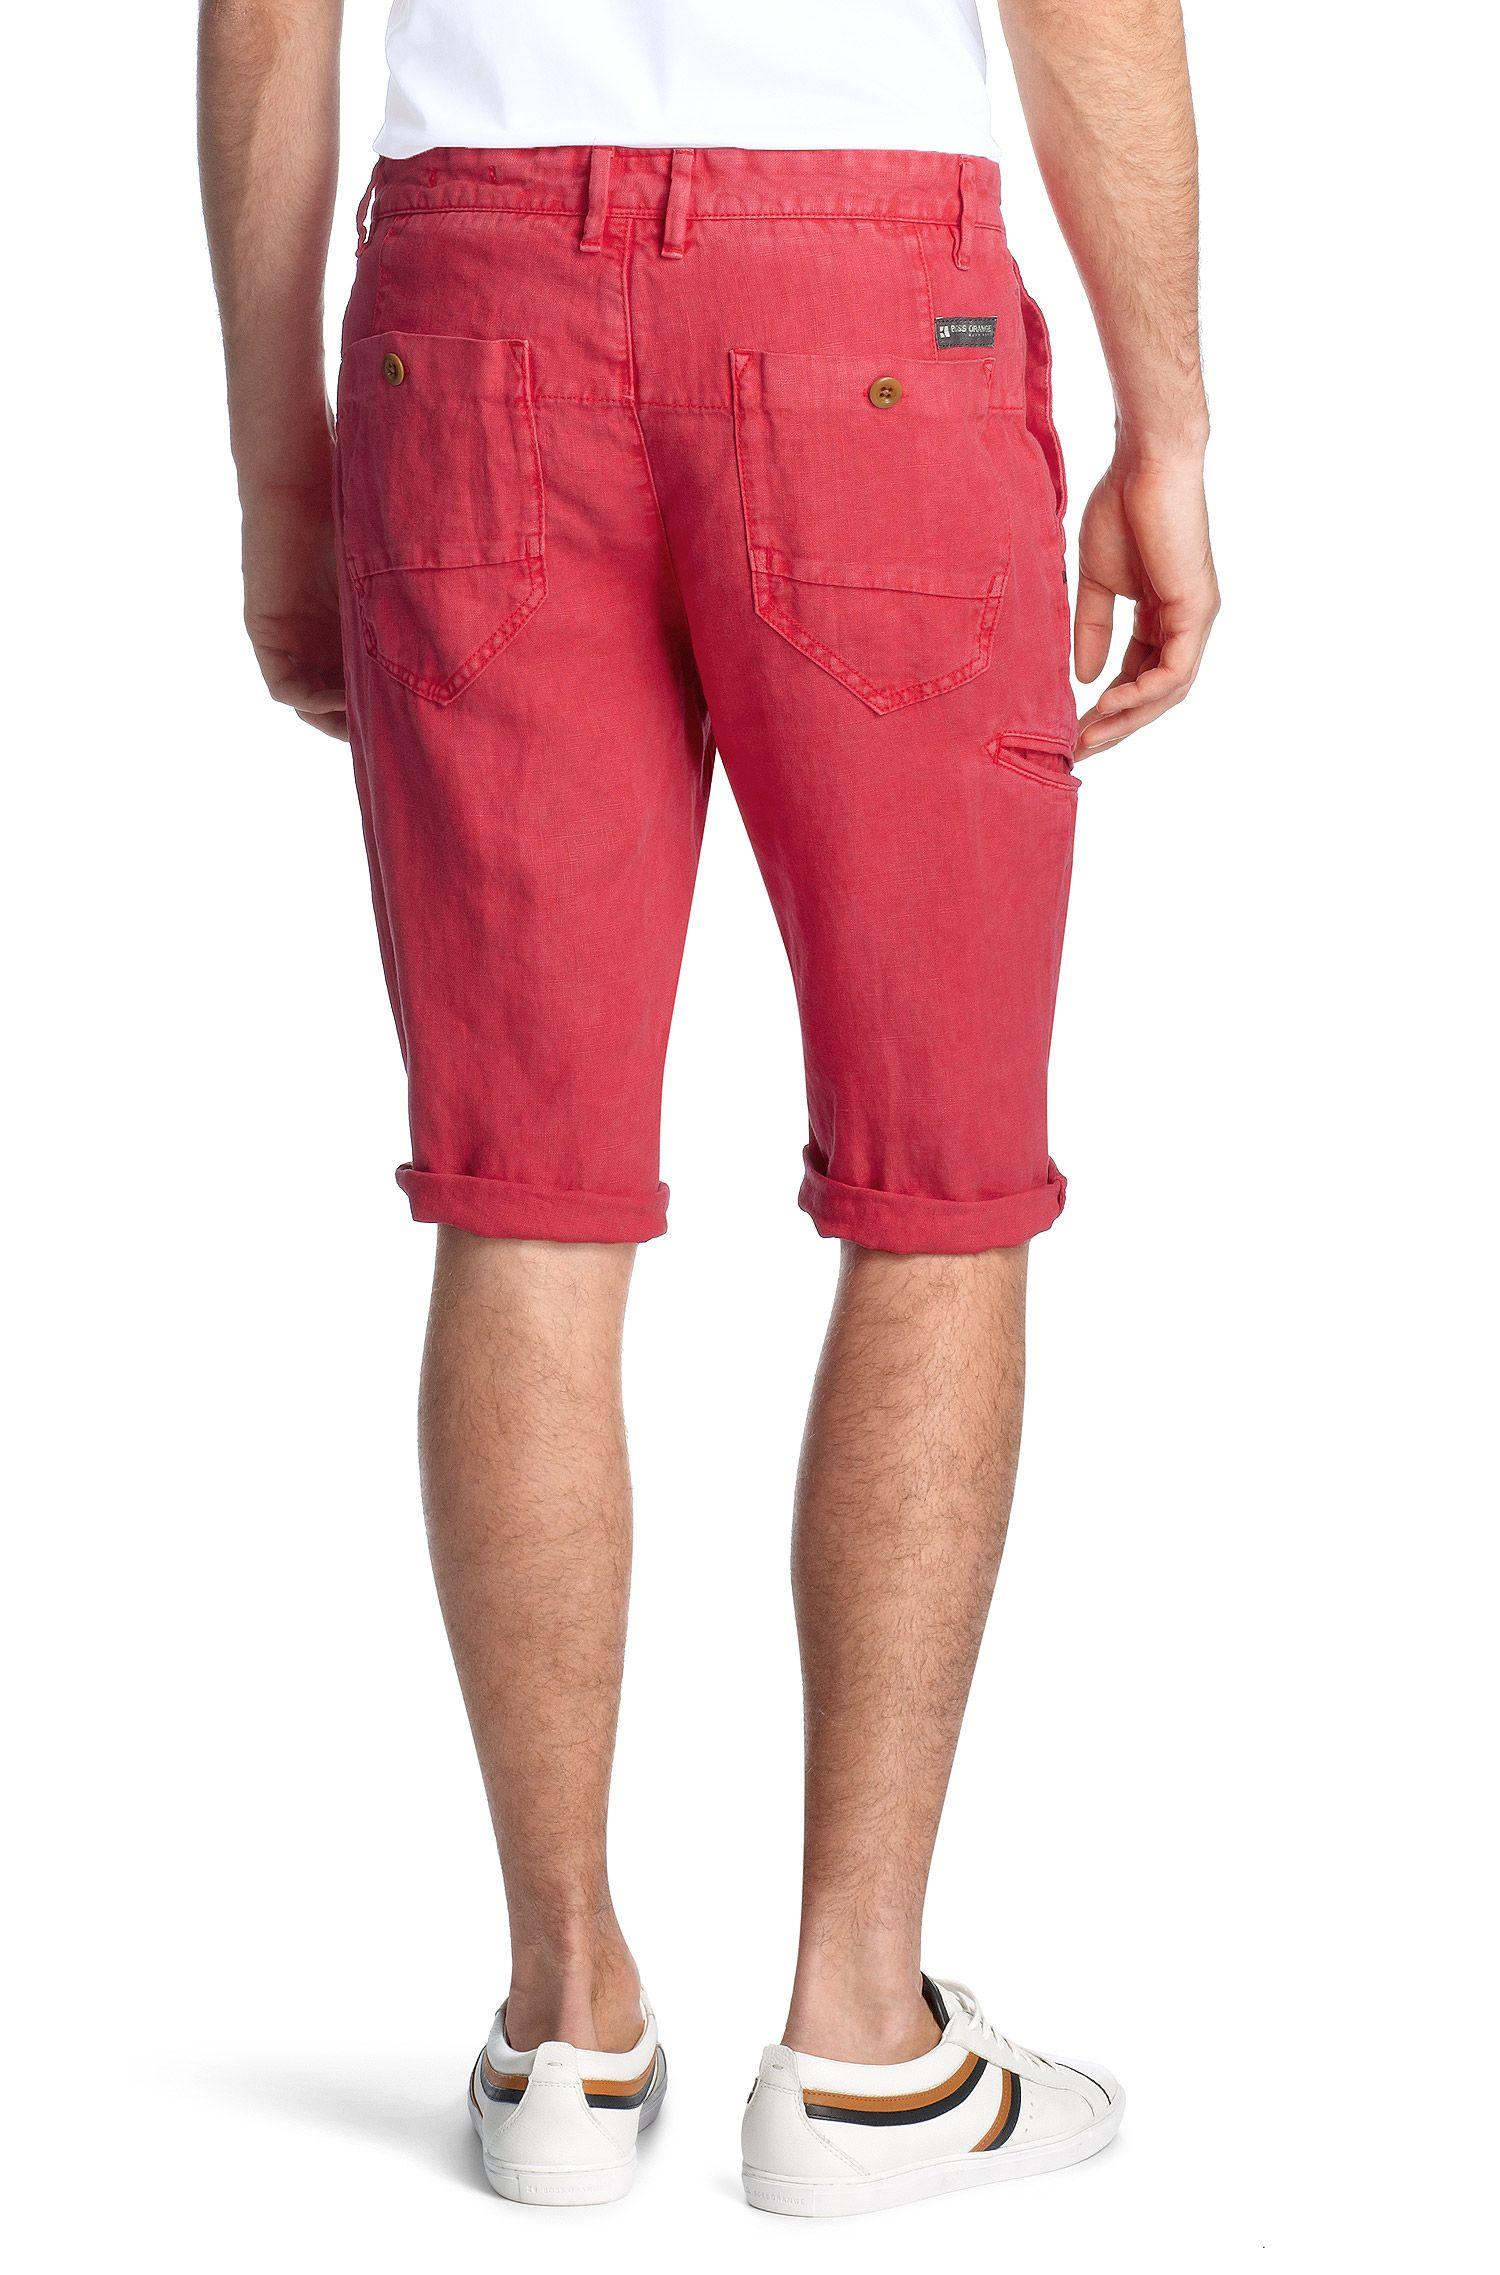 Bermuda en pur lin, Stimo-Shorts-D